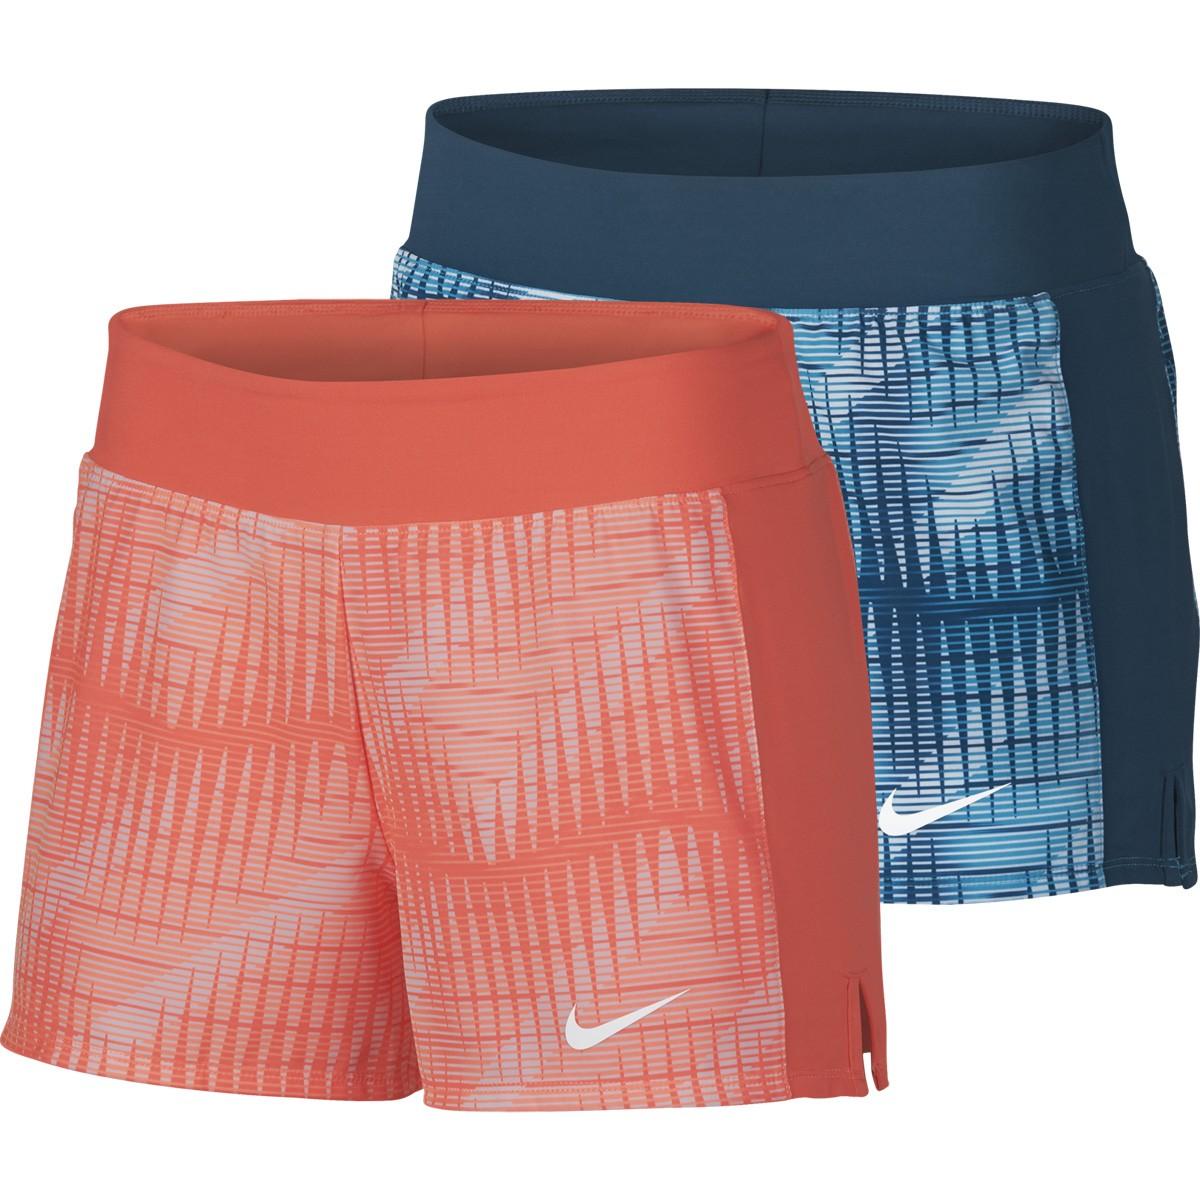 Flex Flex Femme Printed Tennispro Short Short Court Nike Pure x0qntCwgC